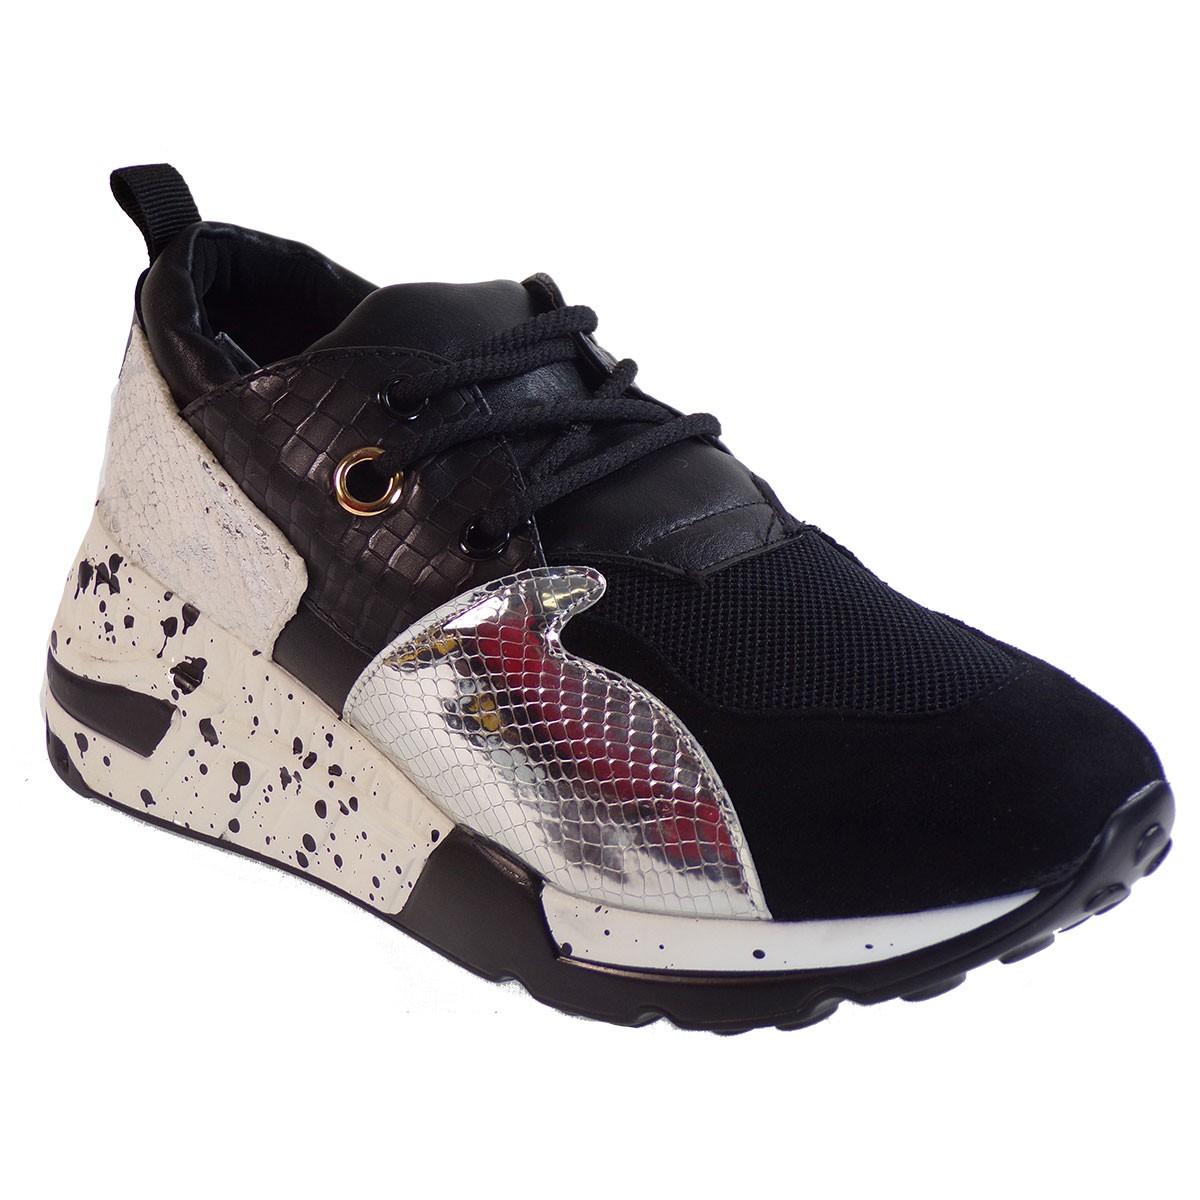 Bagiota Shoes Γυναικεία Παπούτσια Sneakers Αθλητικά H8956 Μαύρο